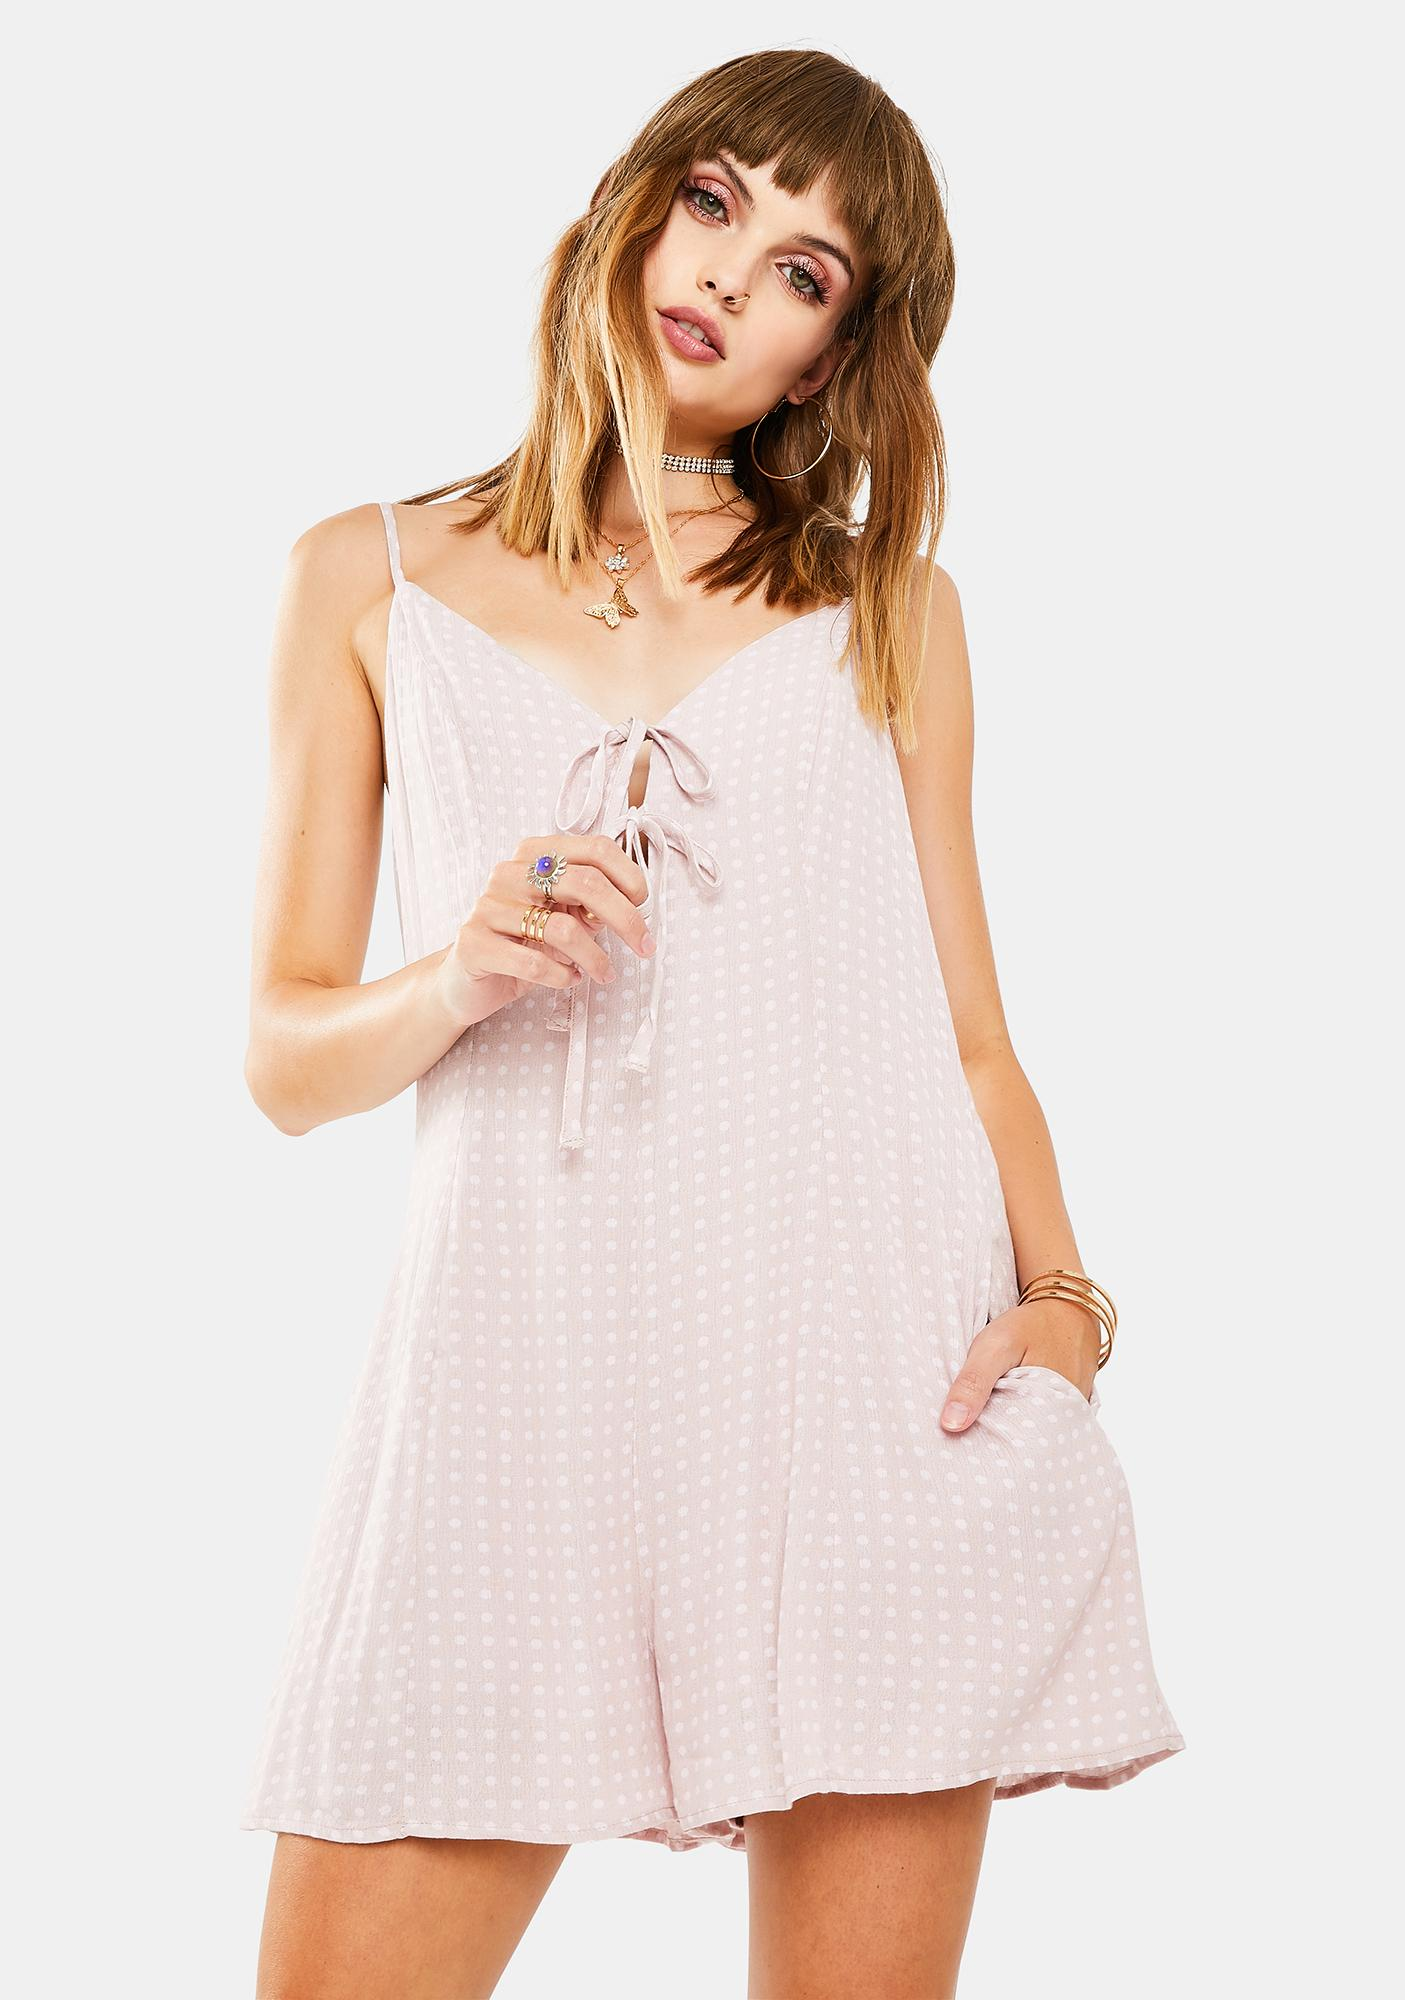 Dress Forum Summer Time Romper